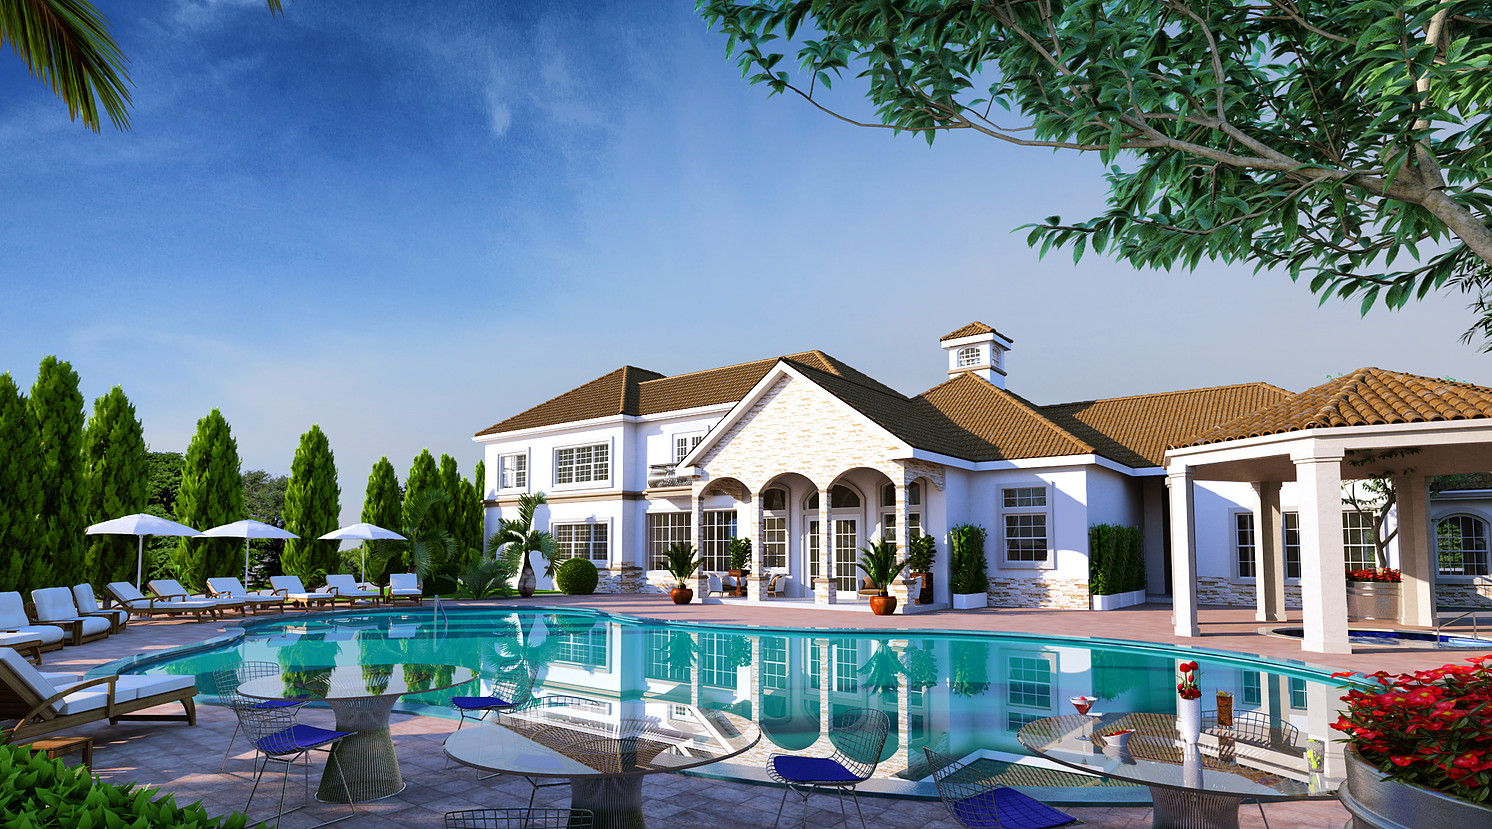 New Meritage Homes in Winter Park, FL - Lakeside | Broker-Associate